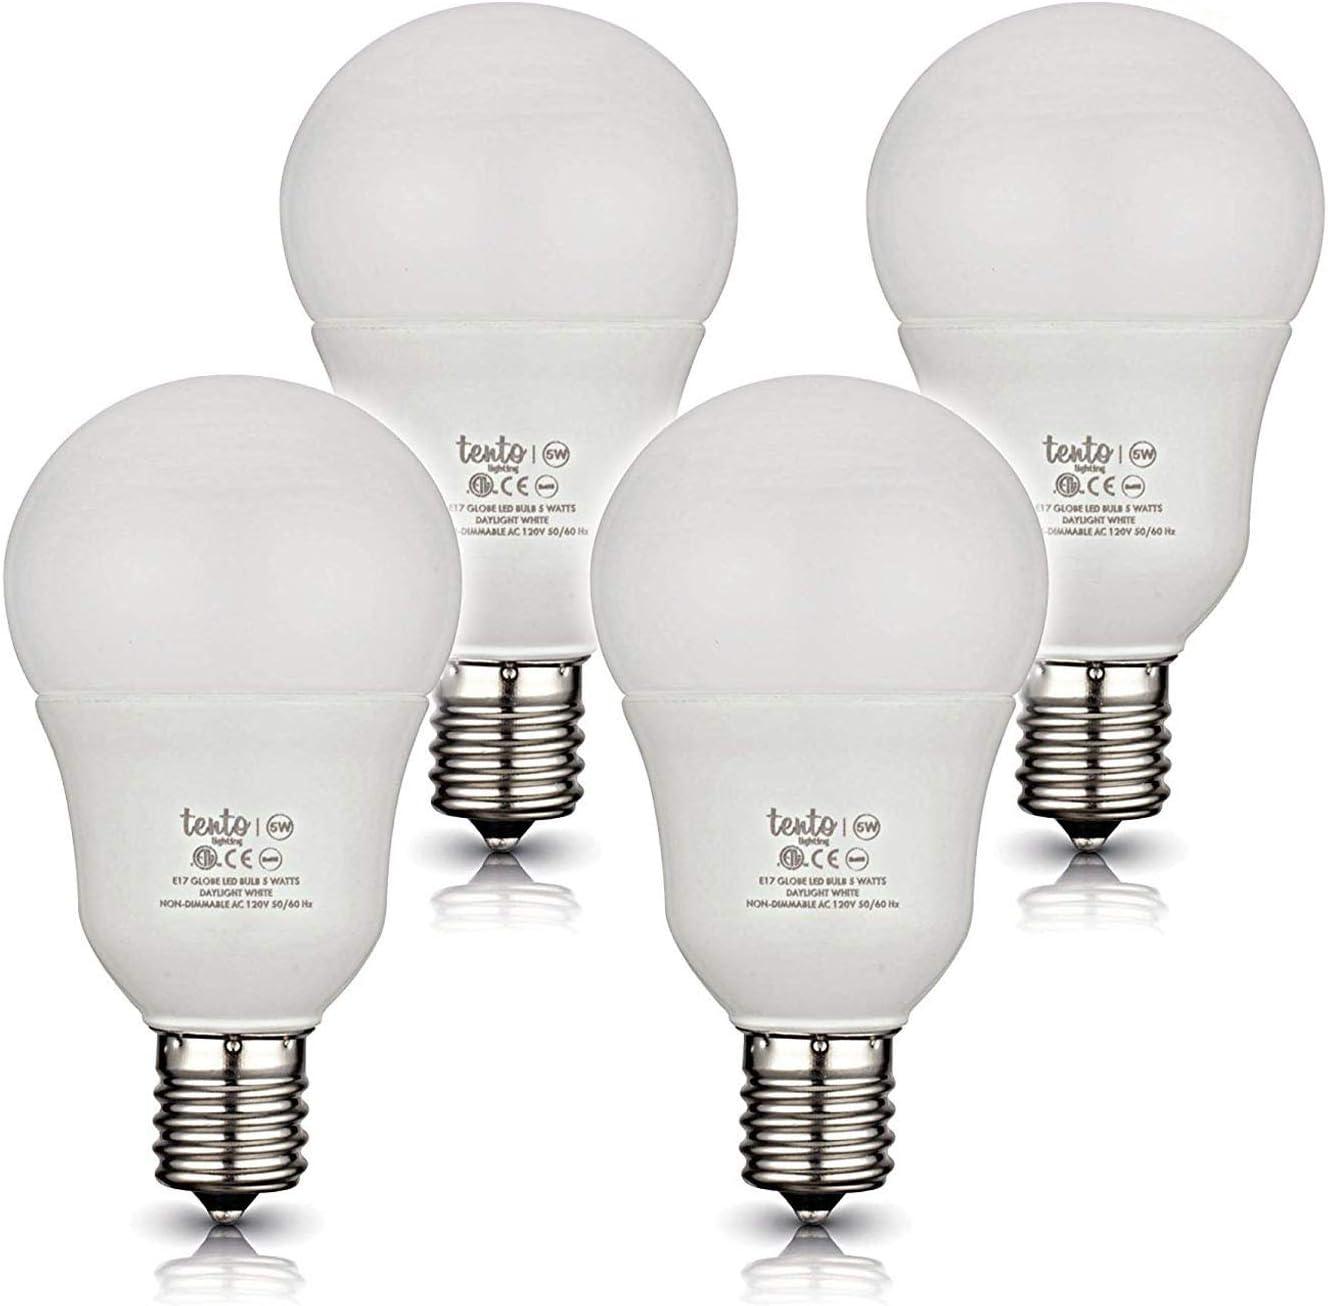 Tento Lighting E17 Globe Intermediate Edison Base Energy Saver Living Room Ceiling Fan Incandescent Led Light Bulbs Warm White 240 Degree Beam Angle 120v 40w 390 420lm 2750k Amazon Com